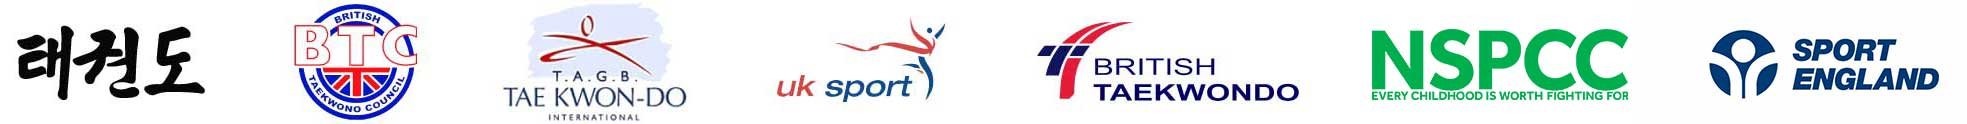 taekwondo - footer logos all